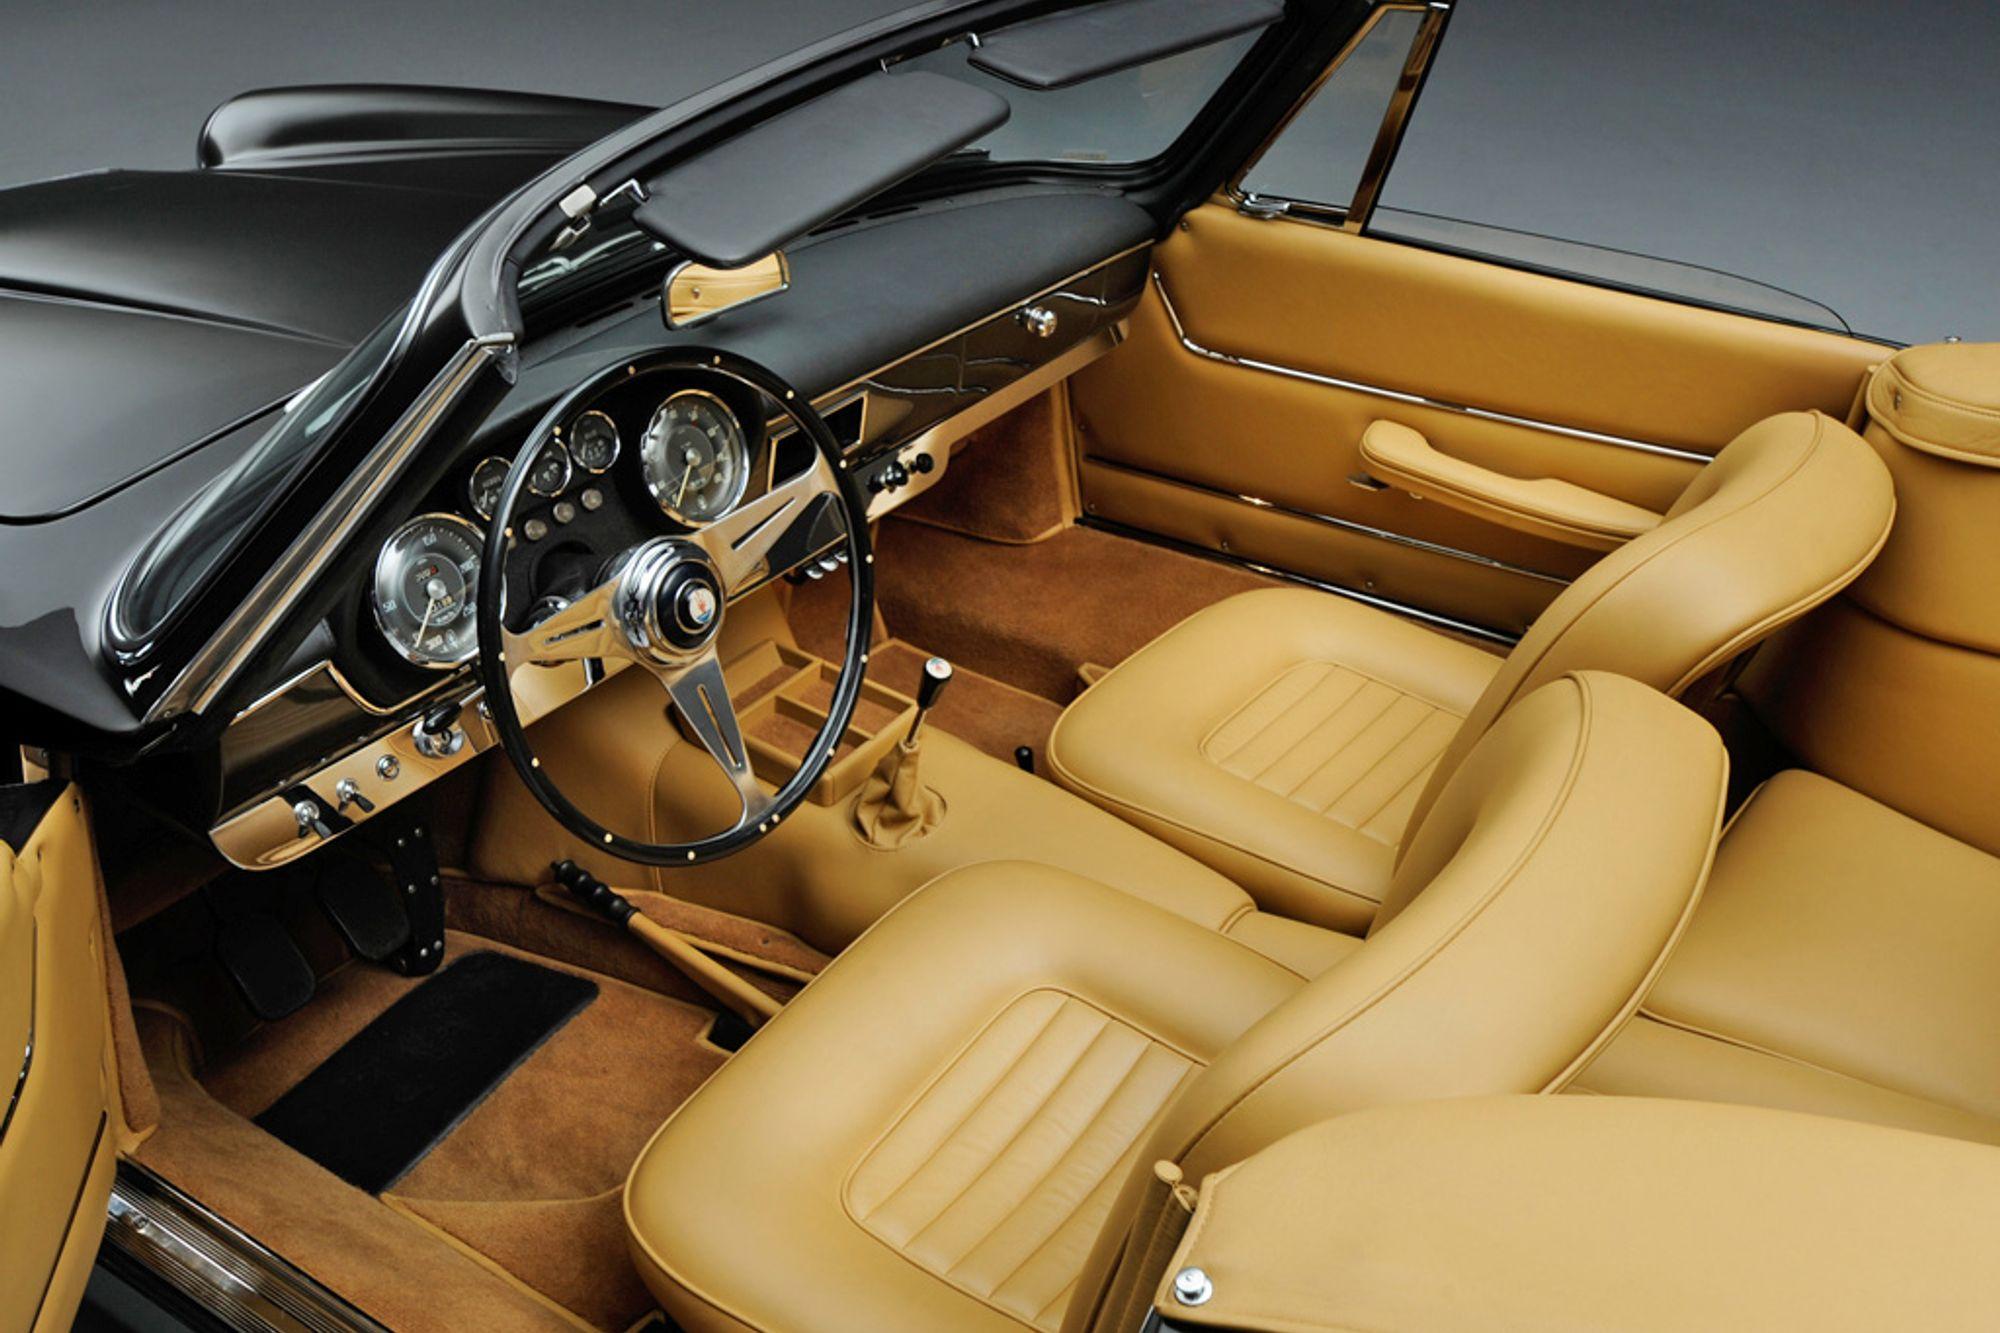 1964 Maserati 3500 GTI Vignale Spyder RHD | Sold | Woodham ...